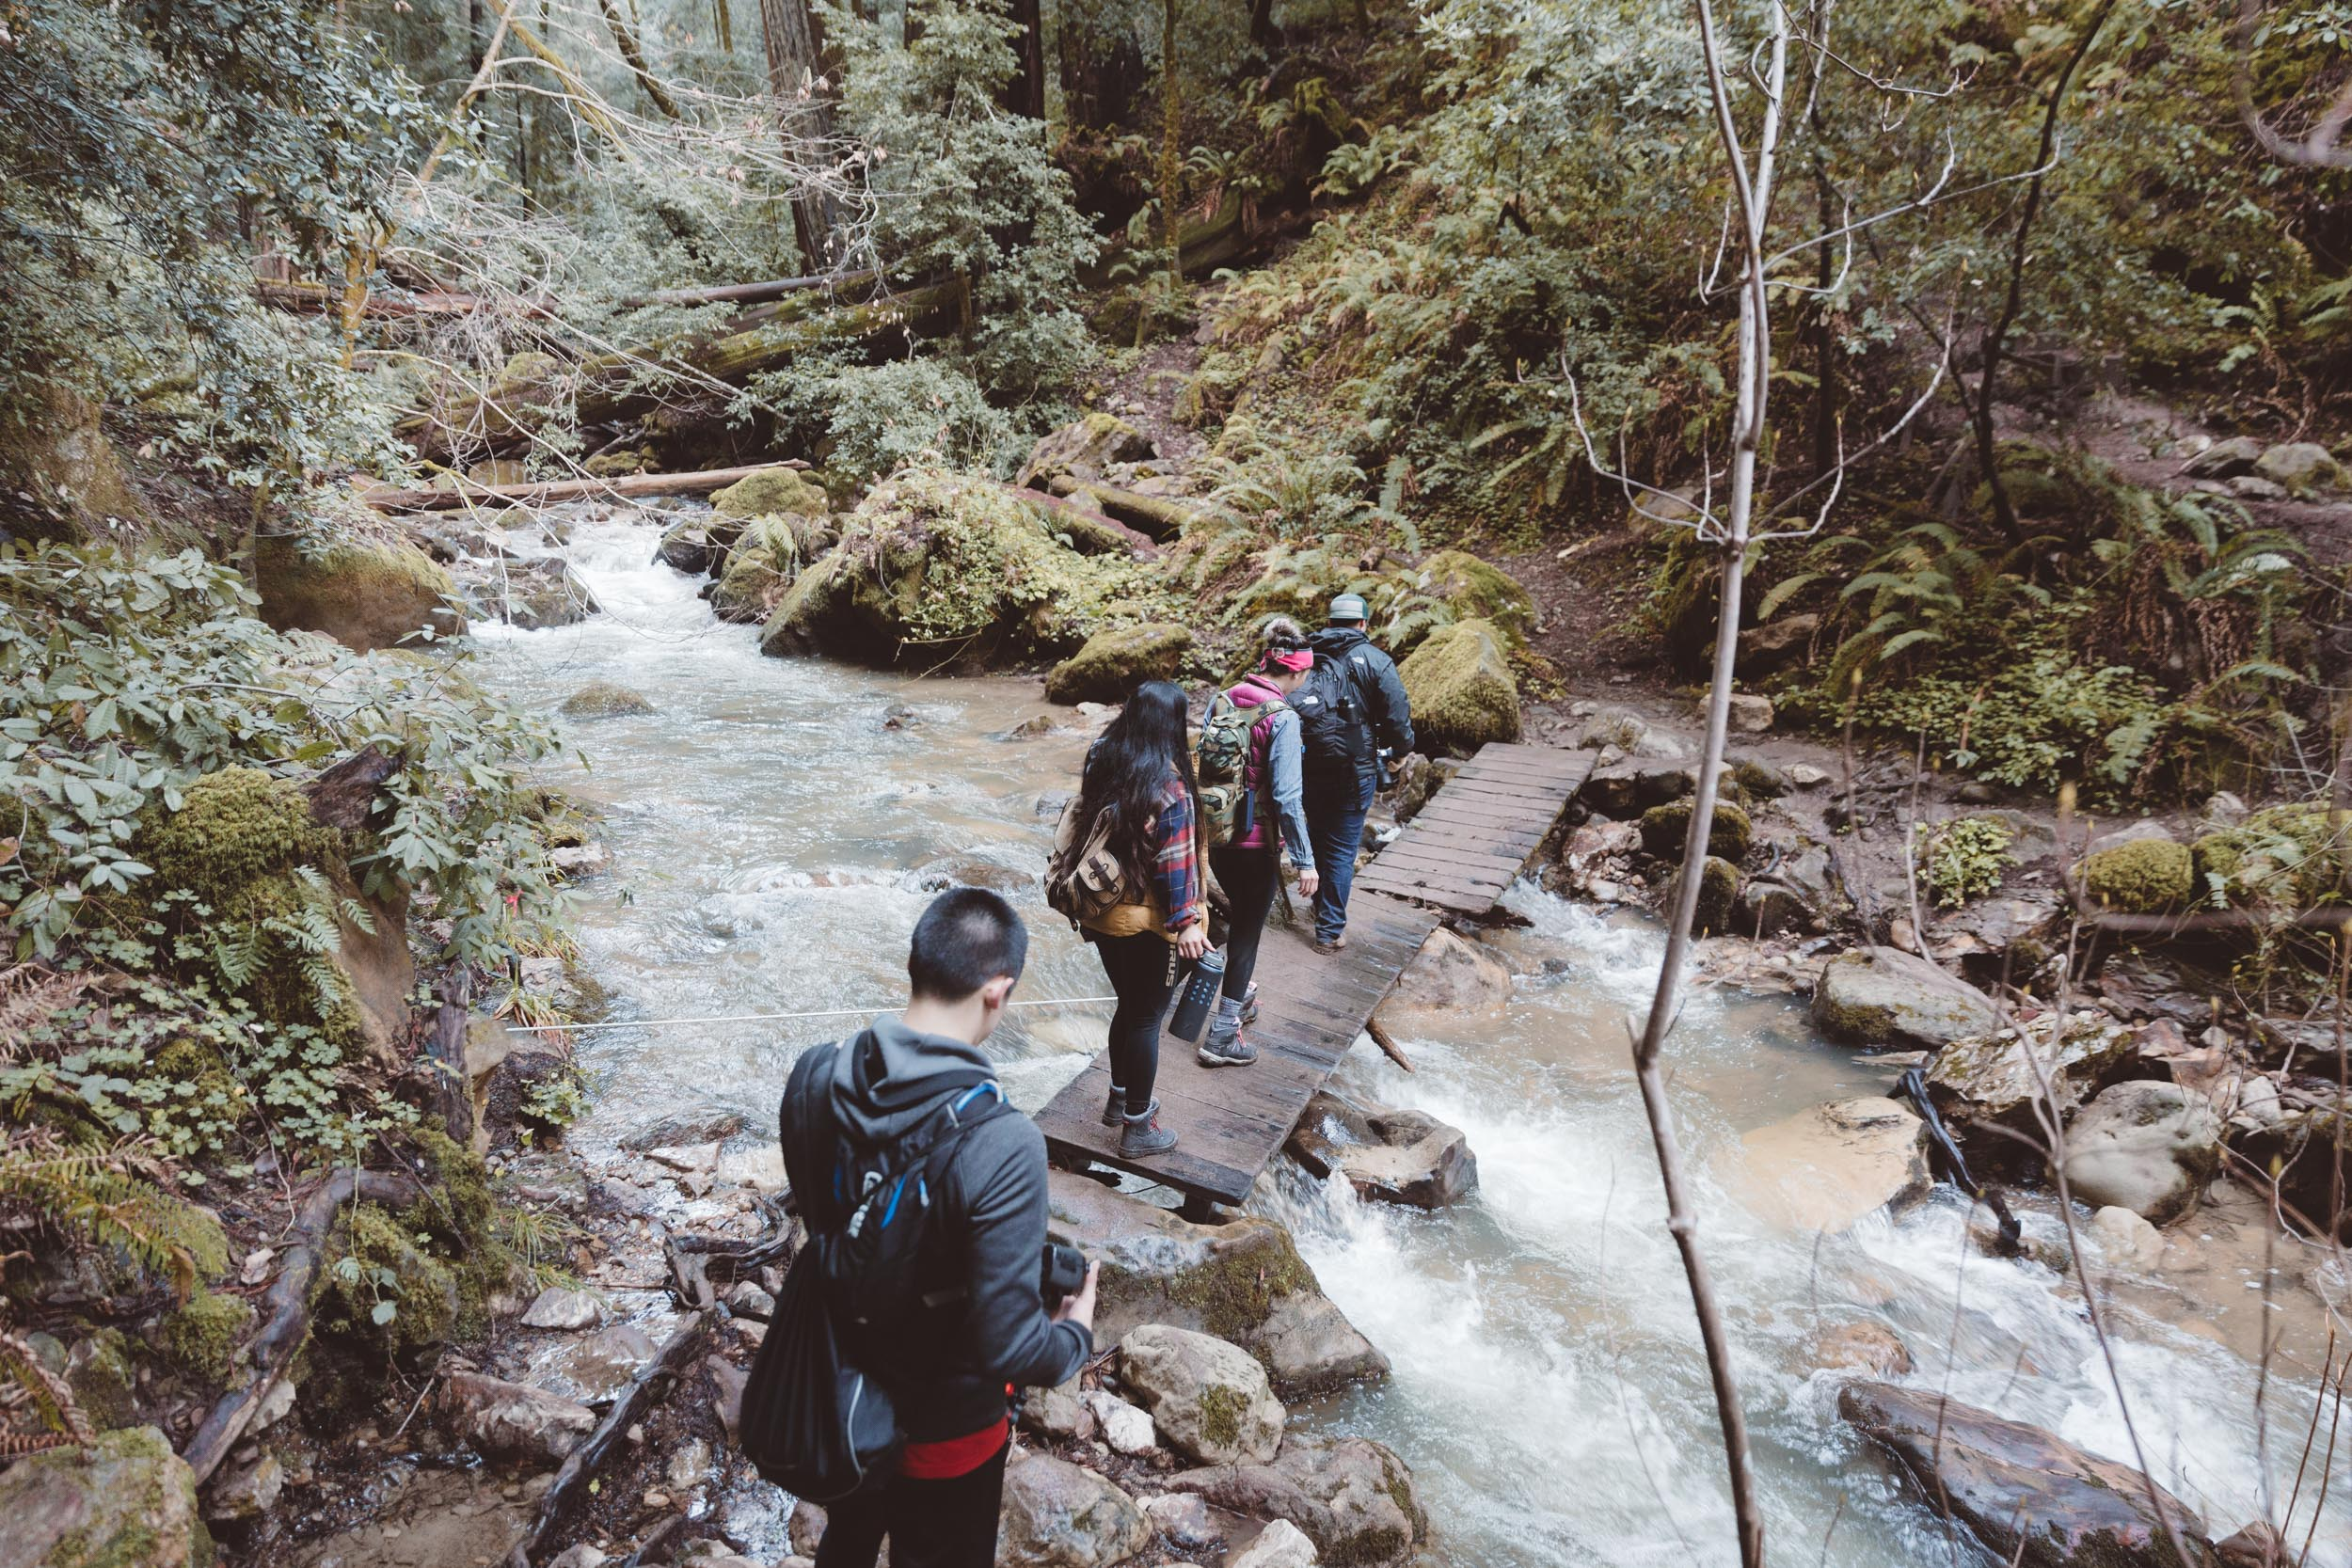 big-basin-berry-creek-crossing-hike-and-shoot-1.jpg